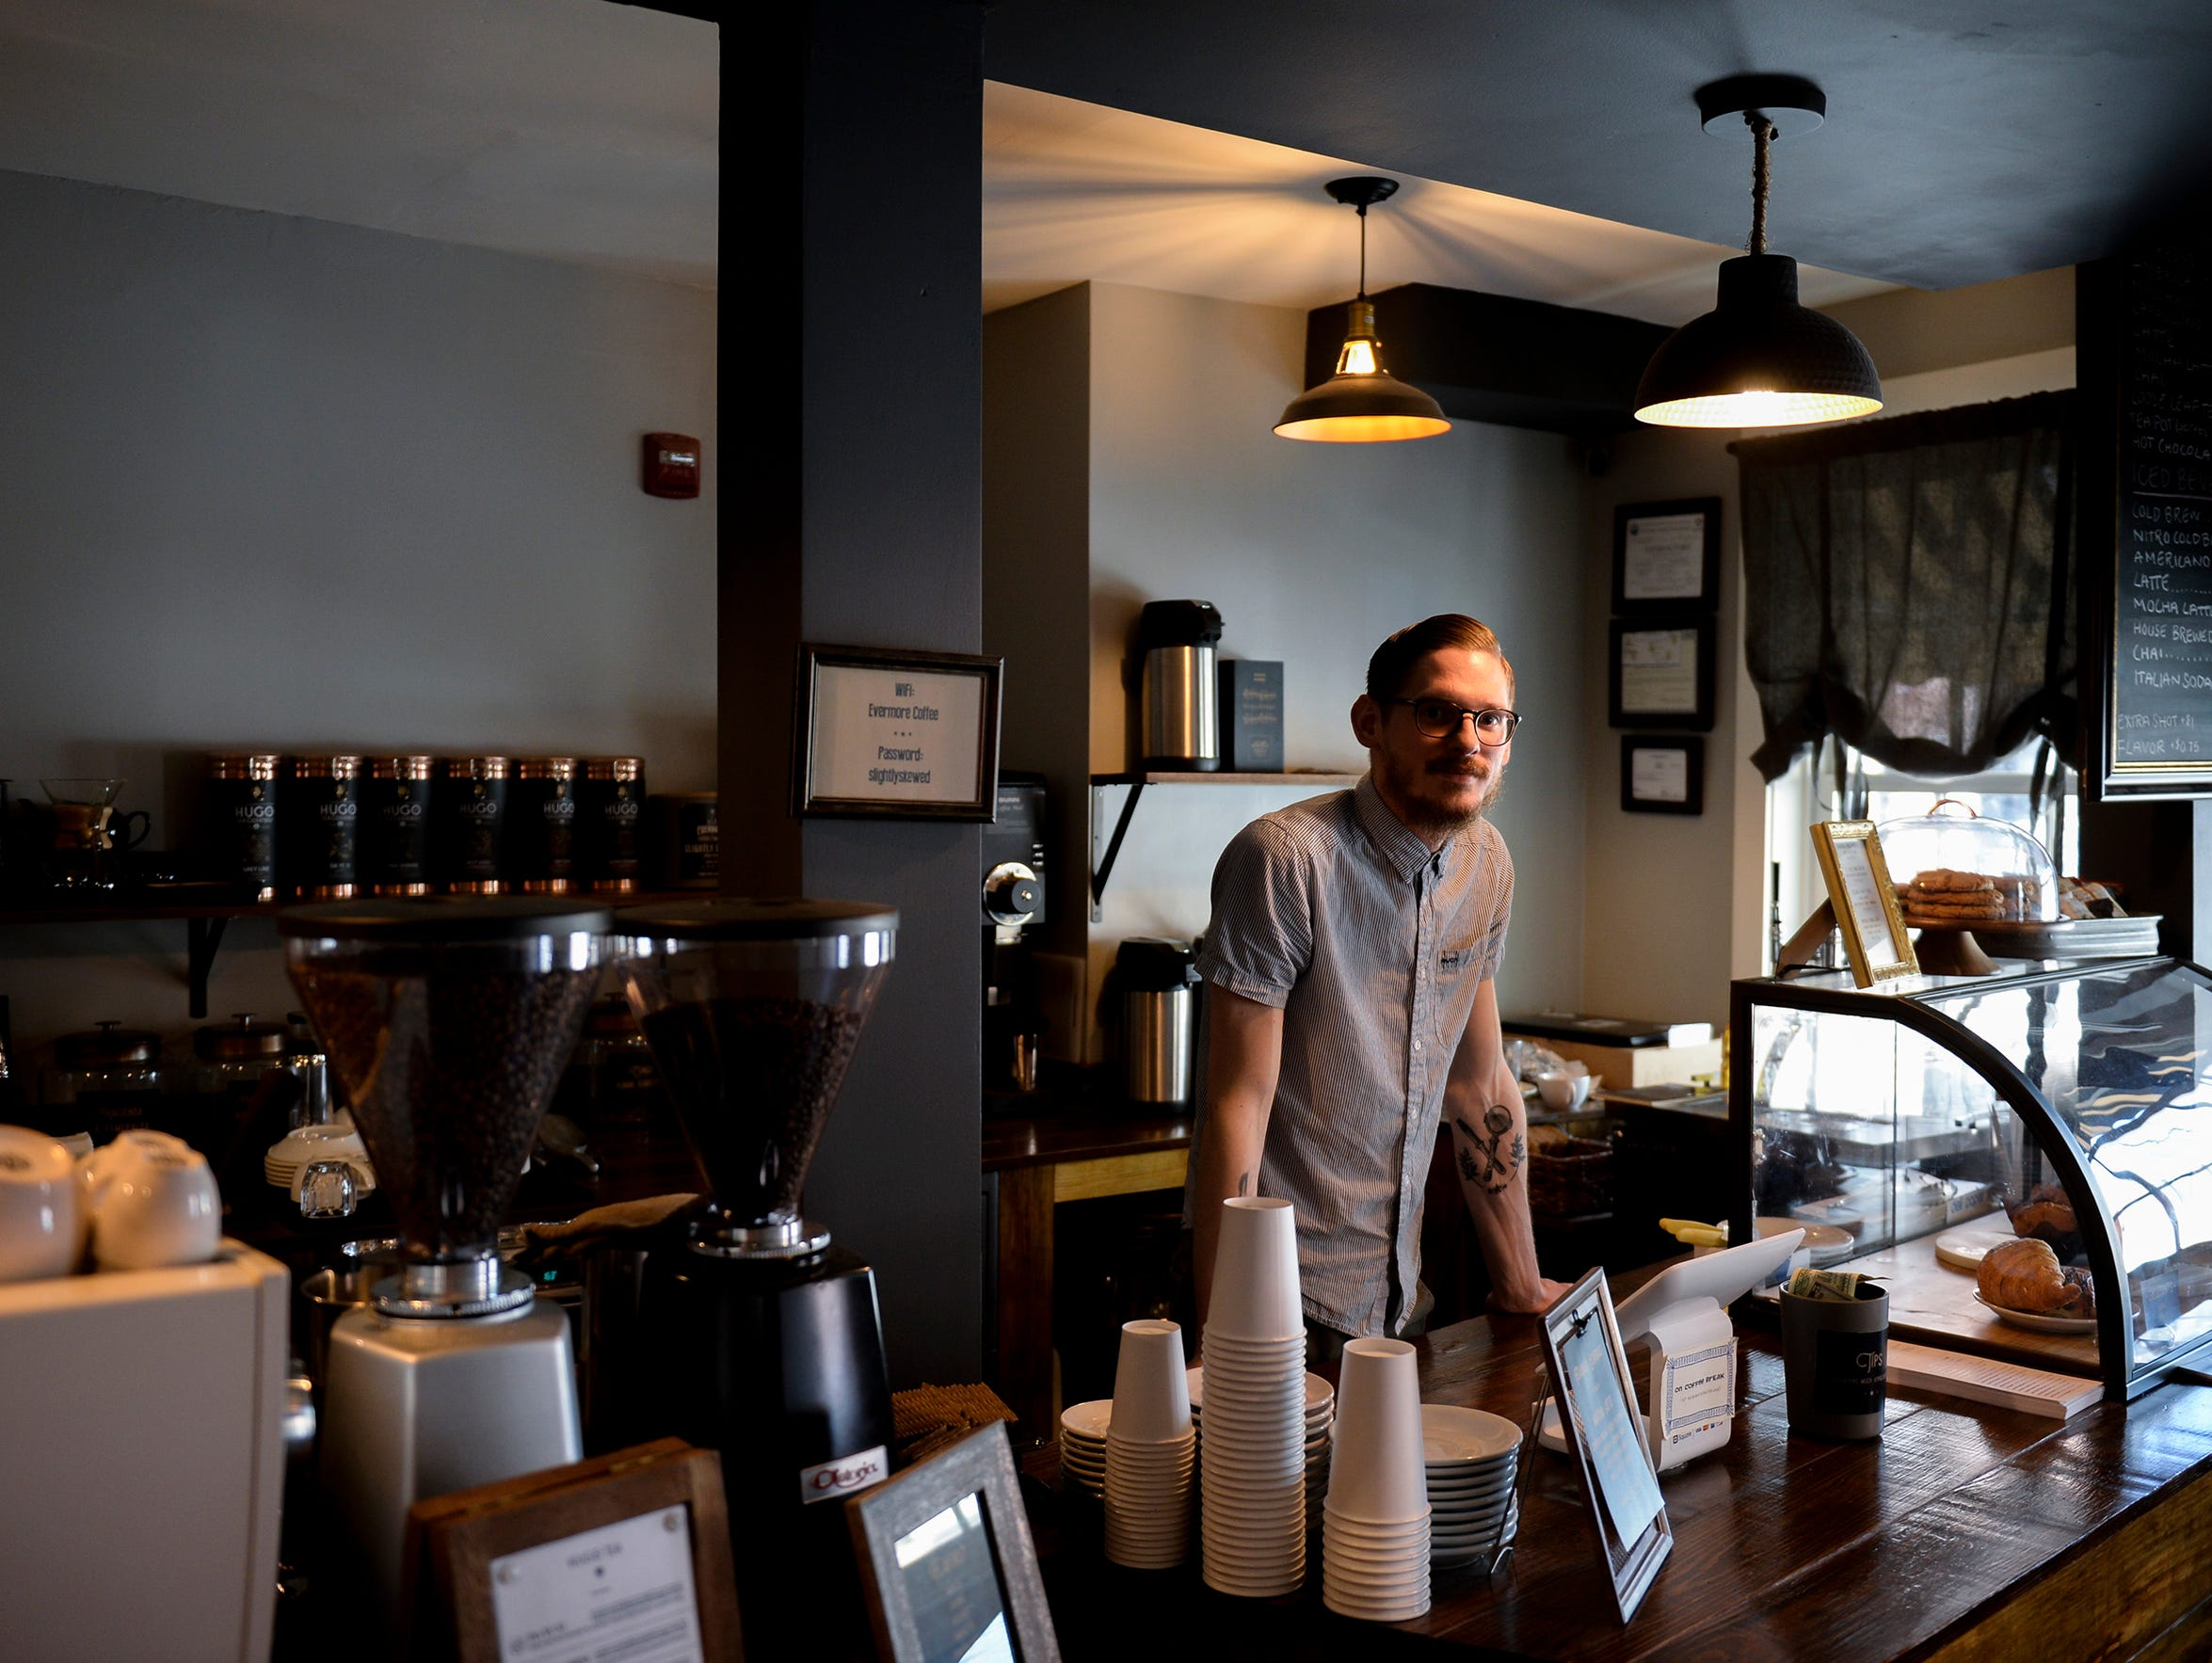 Ryan Vaxmonsky, co-owner of Evermore Coffee Roasters,